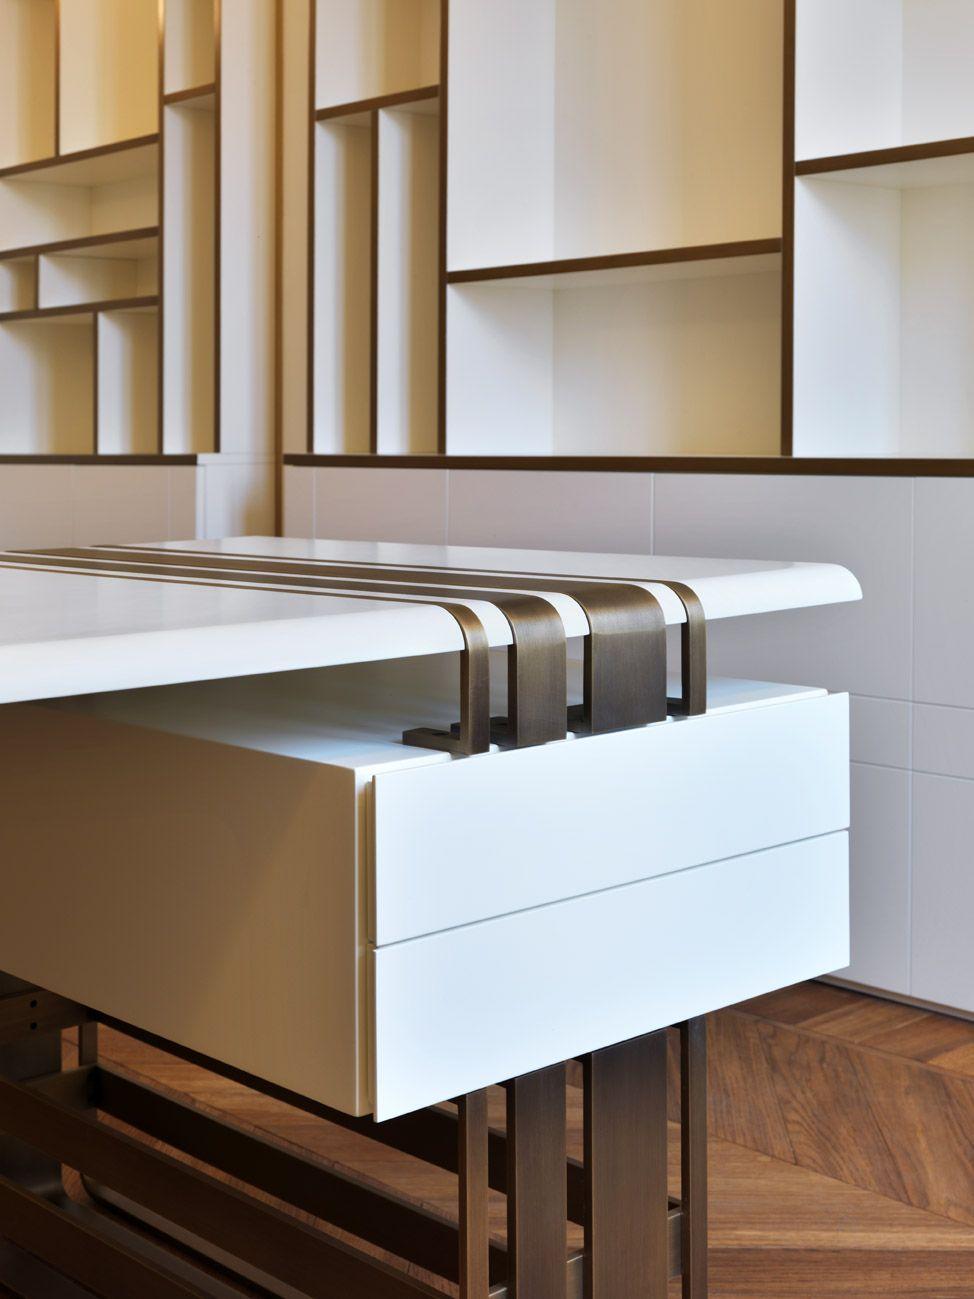 Alessia Garibaldi Giorgio Piliego Studi Notarili In Milano Furniture Furniture Design Furniture Details